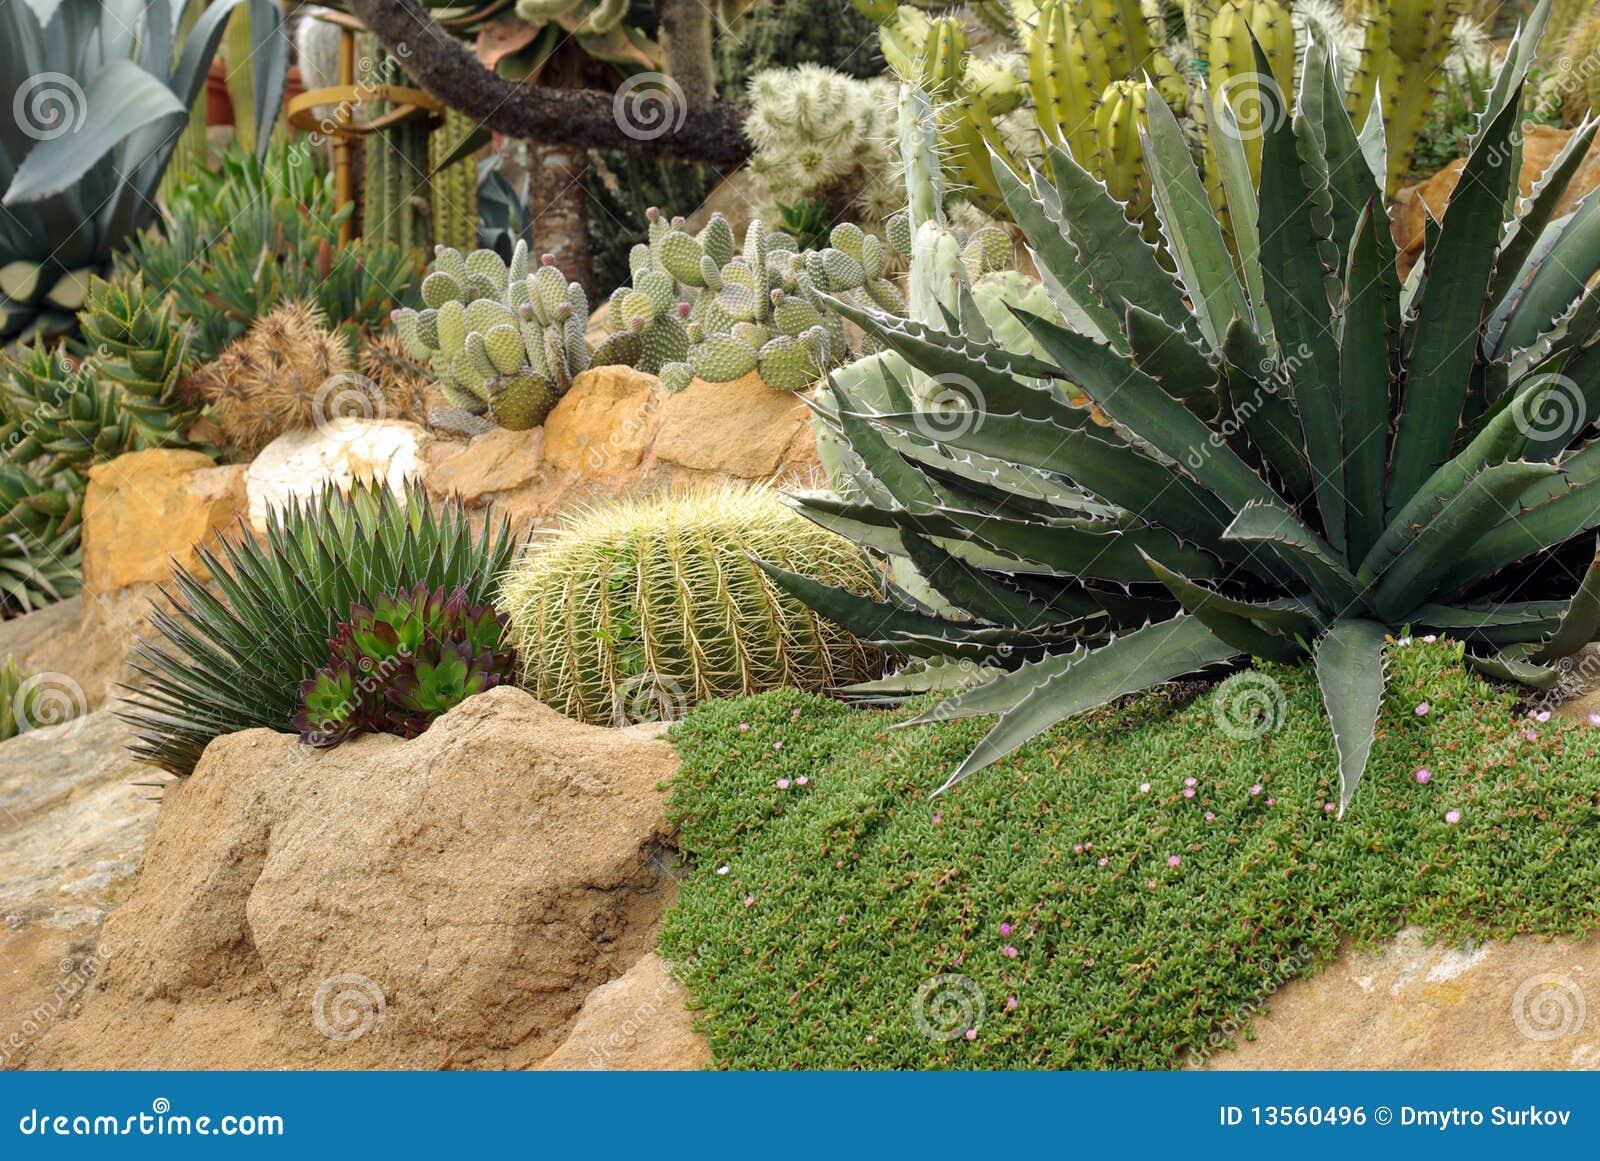 parterre du cactus photo stock image du abstrait floral. Black Bedroom Furniture Sets. Home Design Ideas